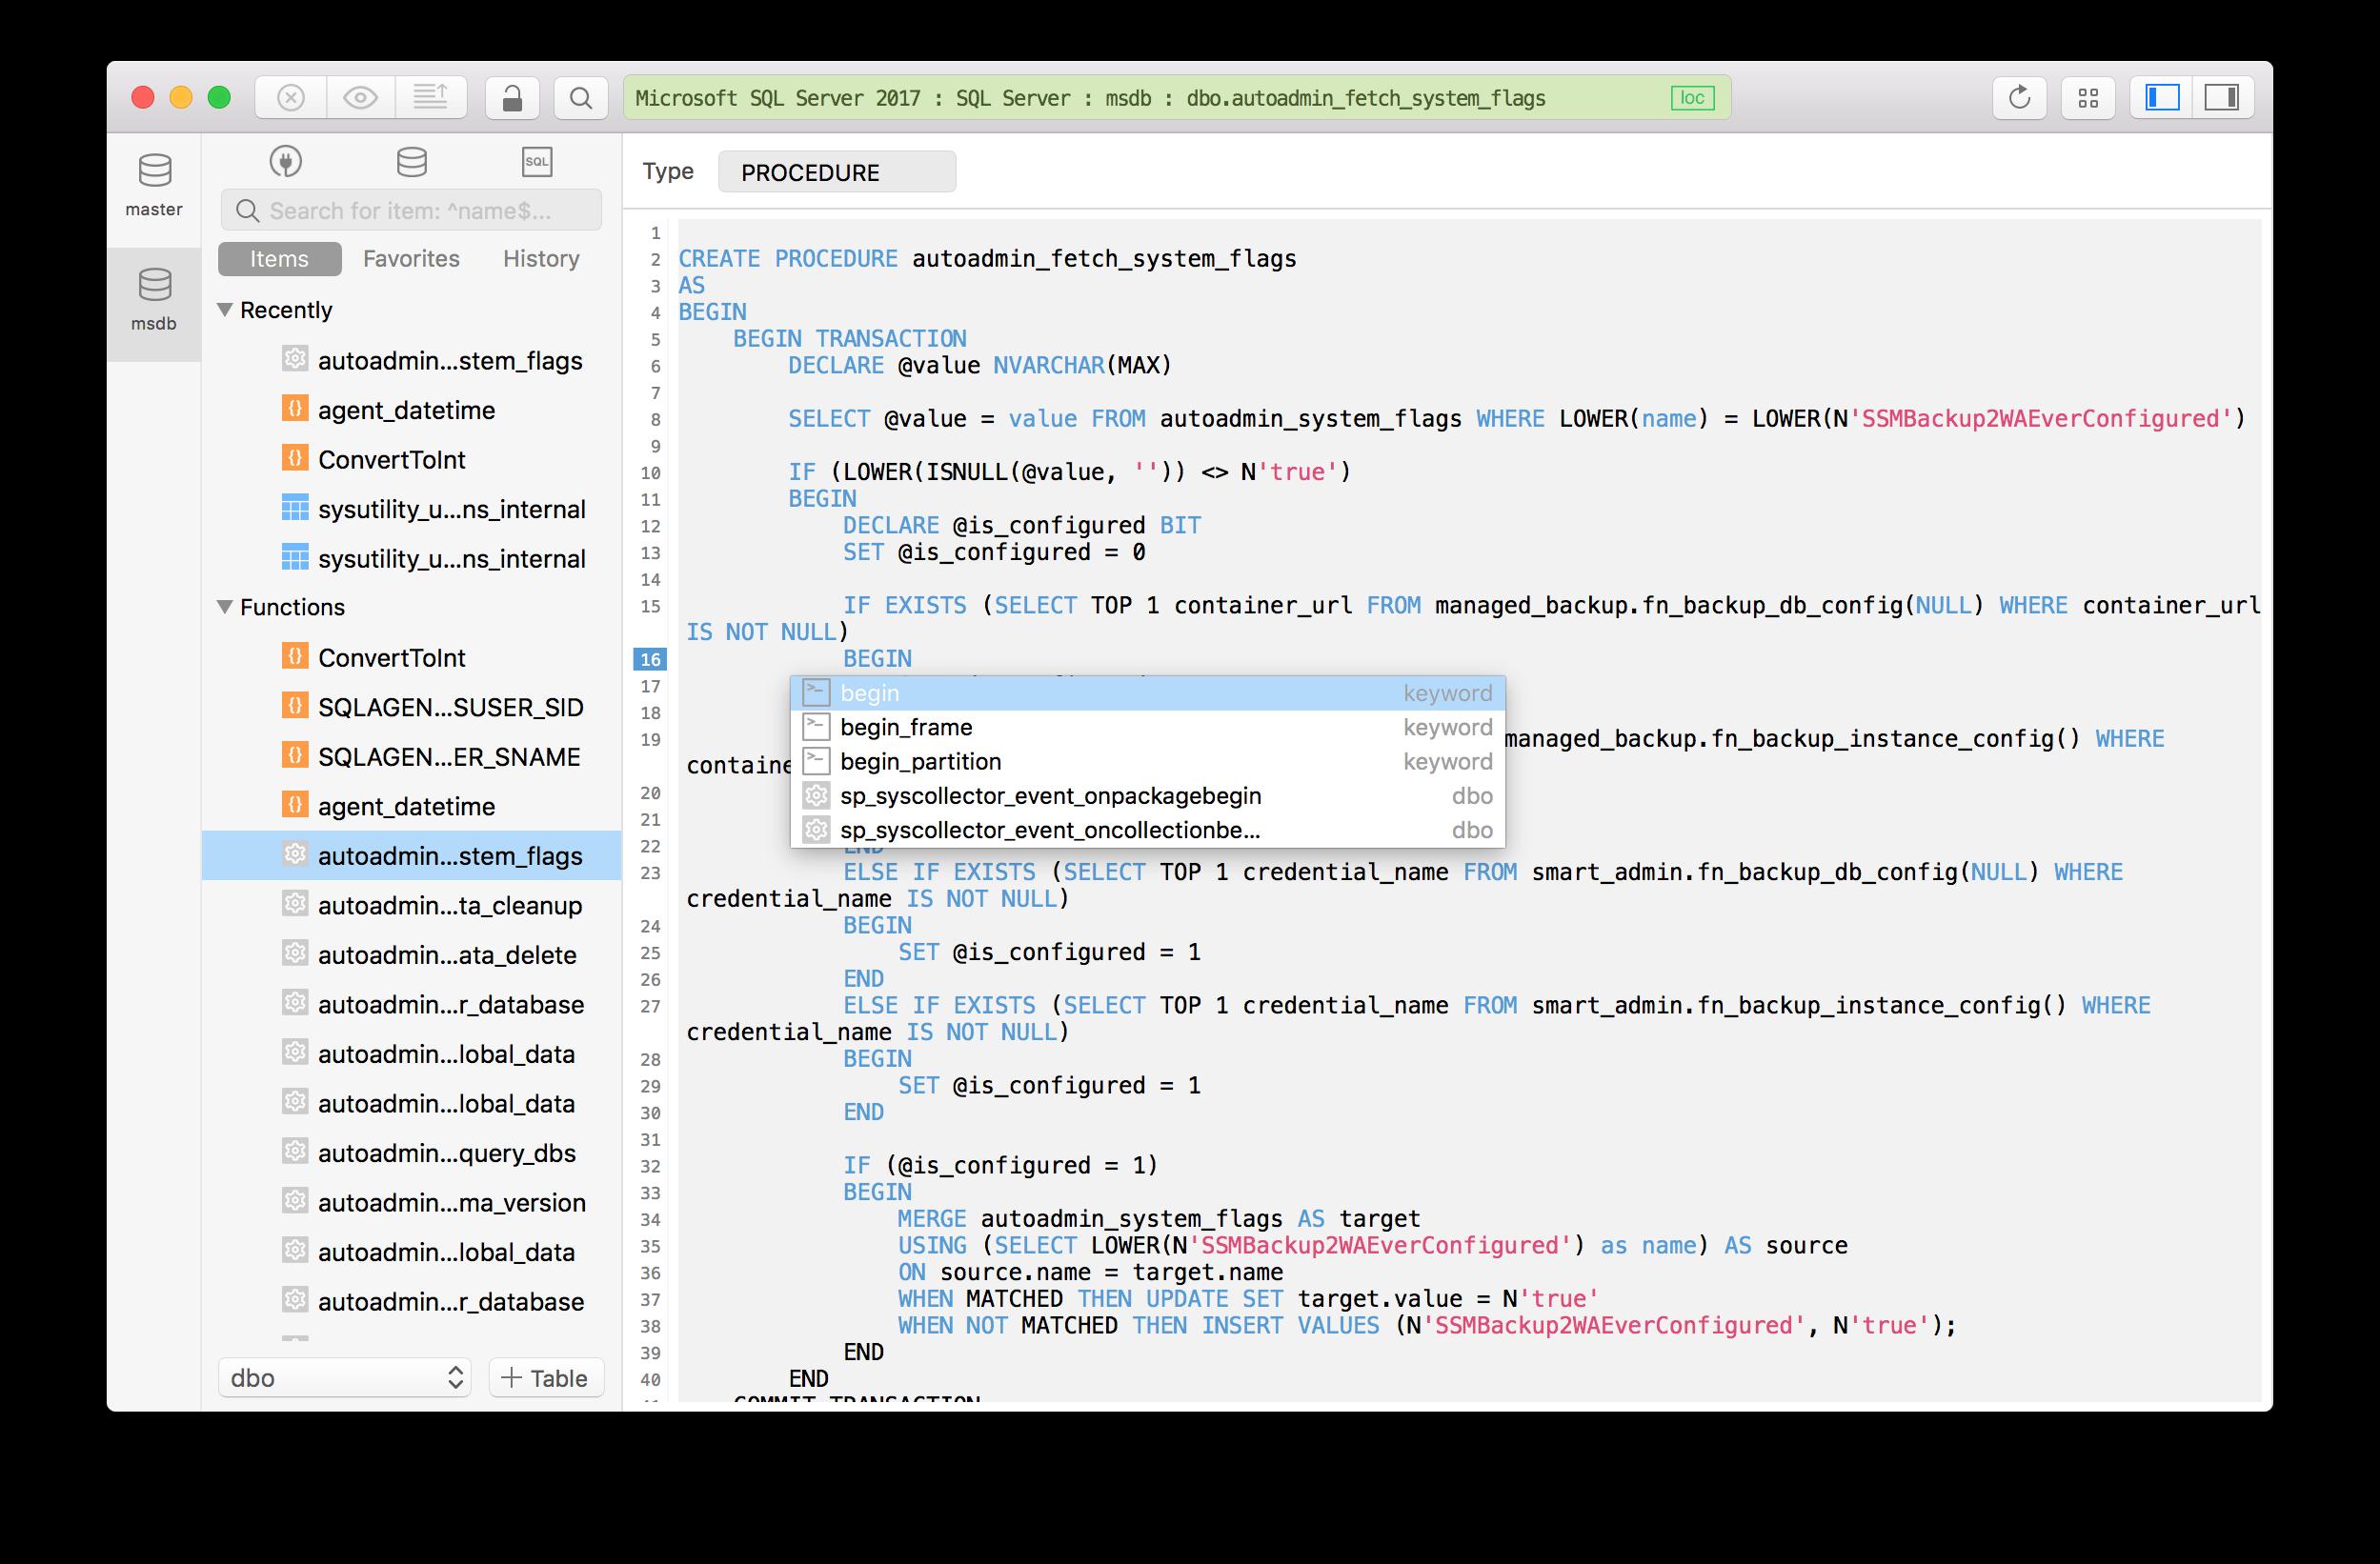 The Best Microsoft SQL Server GUI Tool for Mac - TablePlus